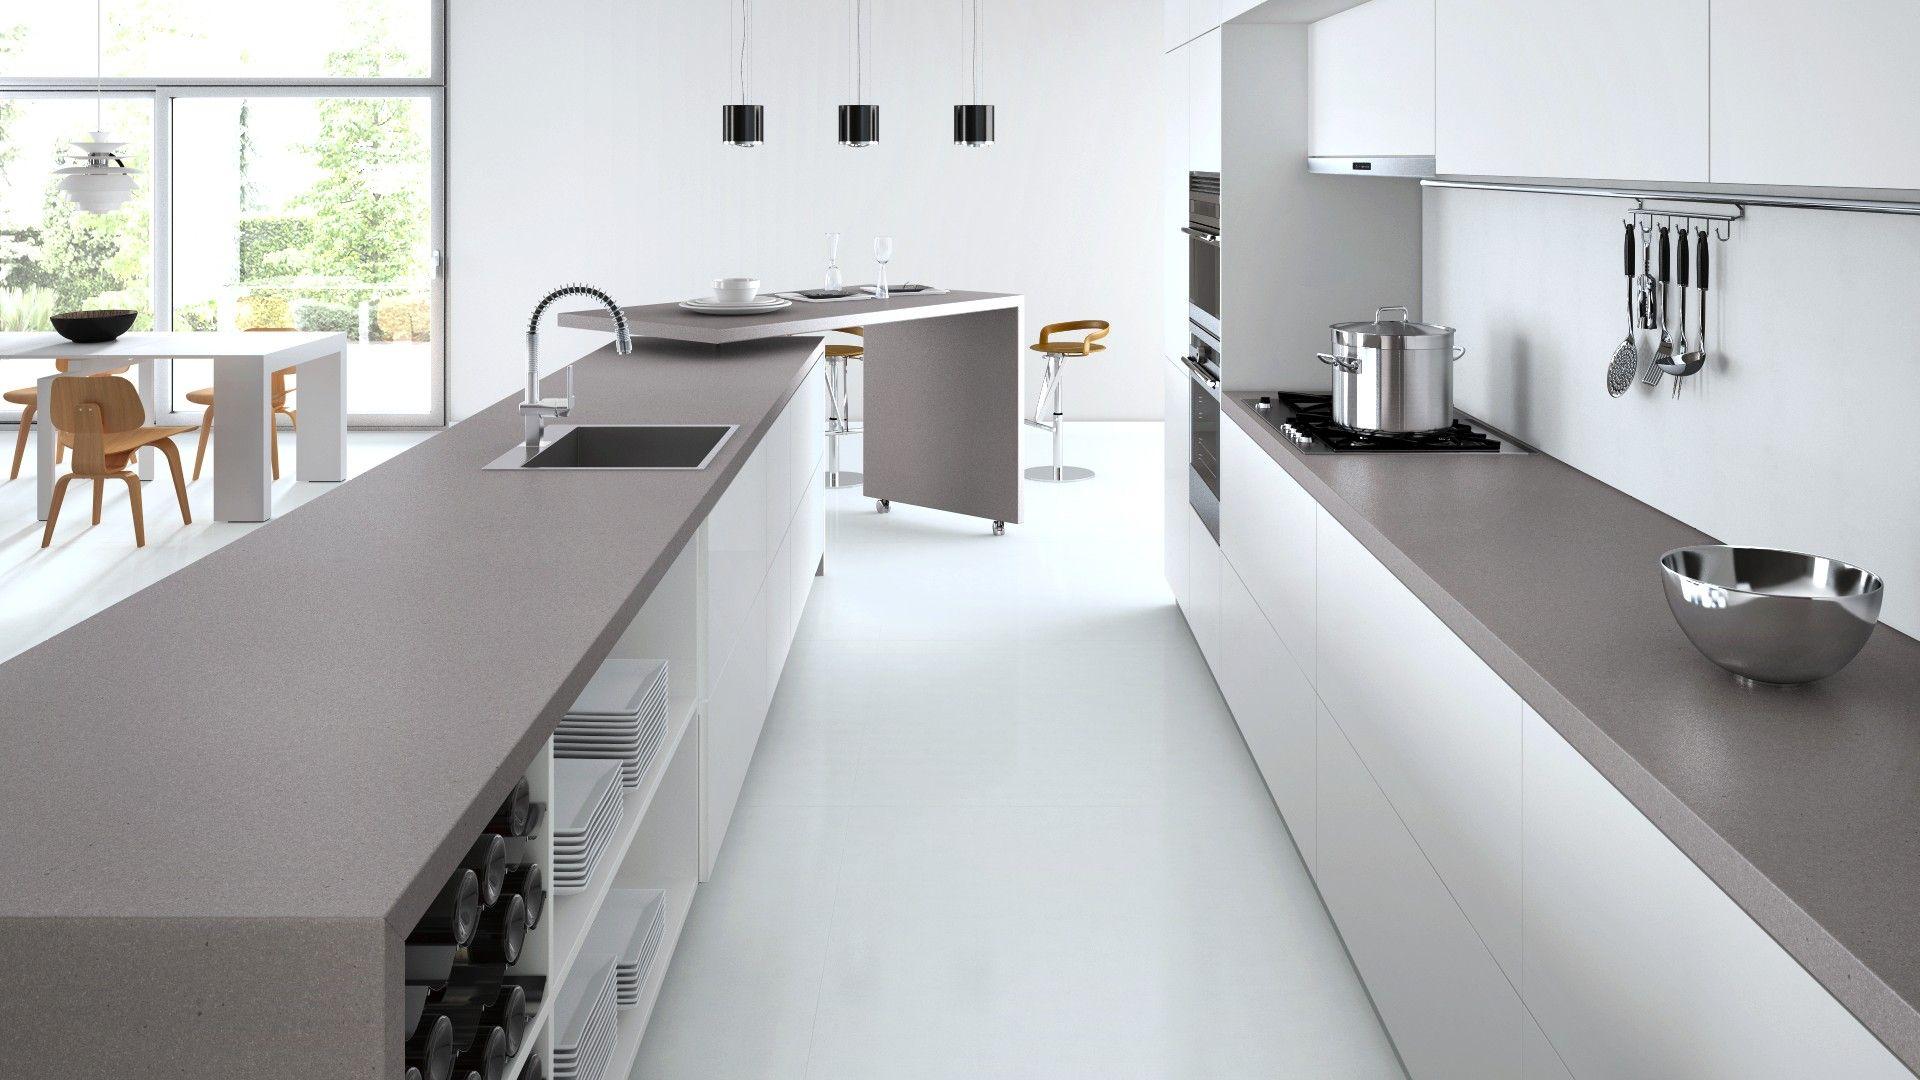 Caesarstone Sleek Concrete With White Cabinets Kitchen Kitchen Kitchen Flooring Kitchen